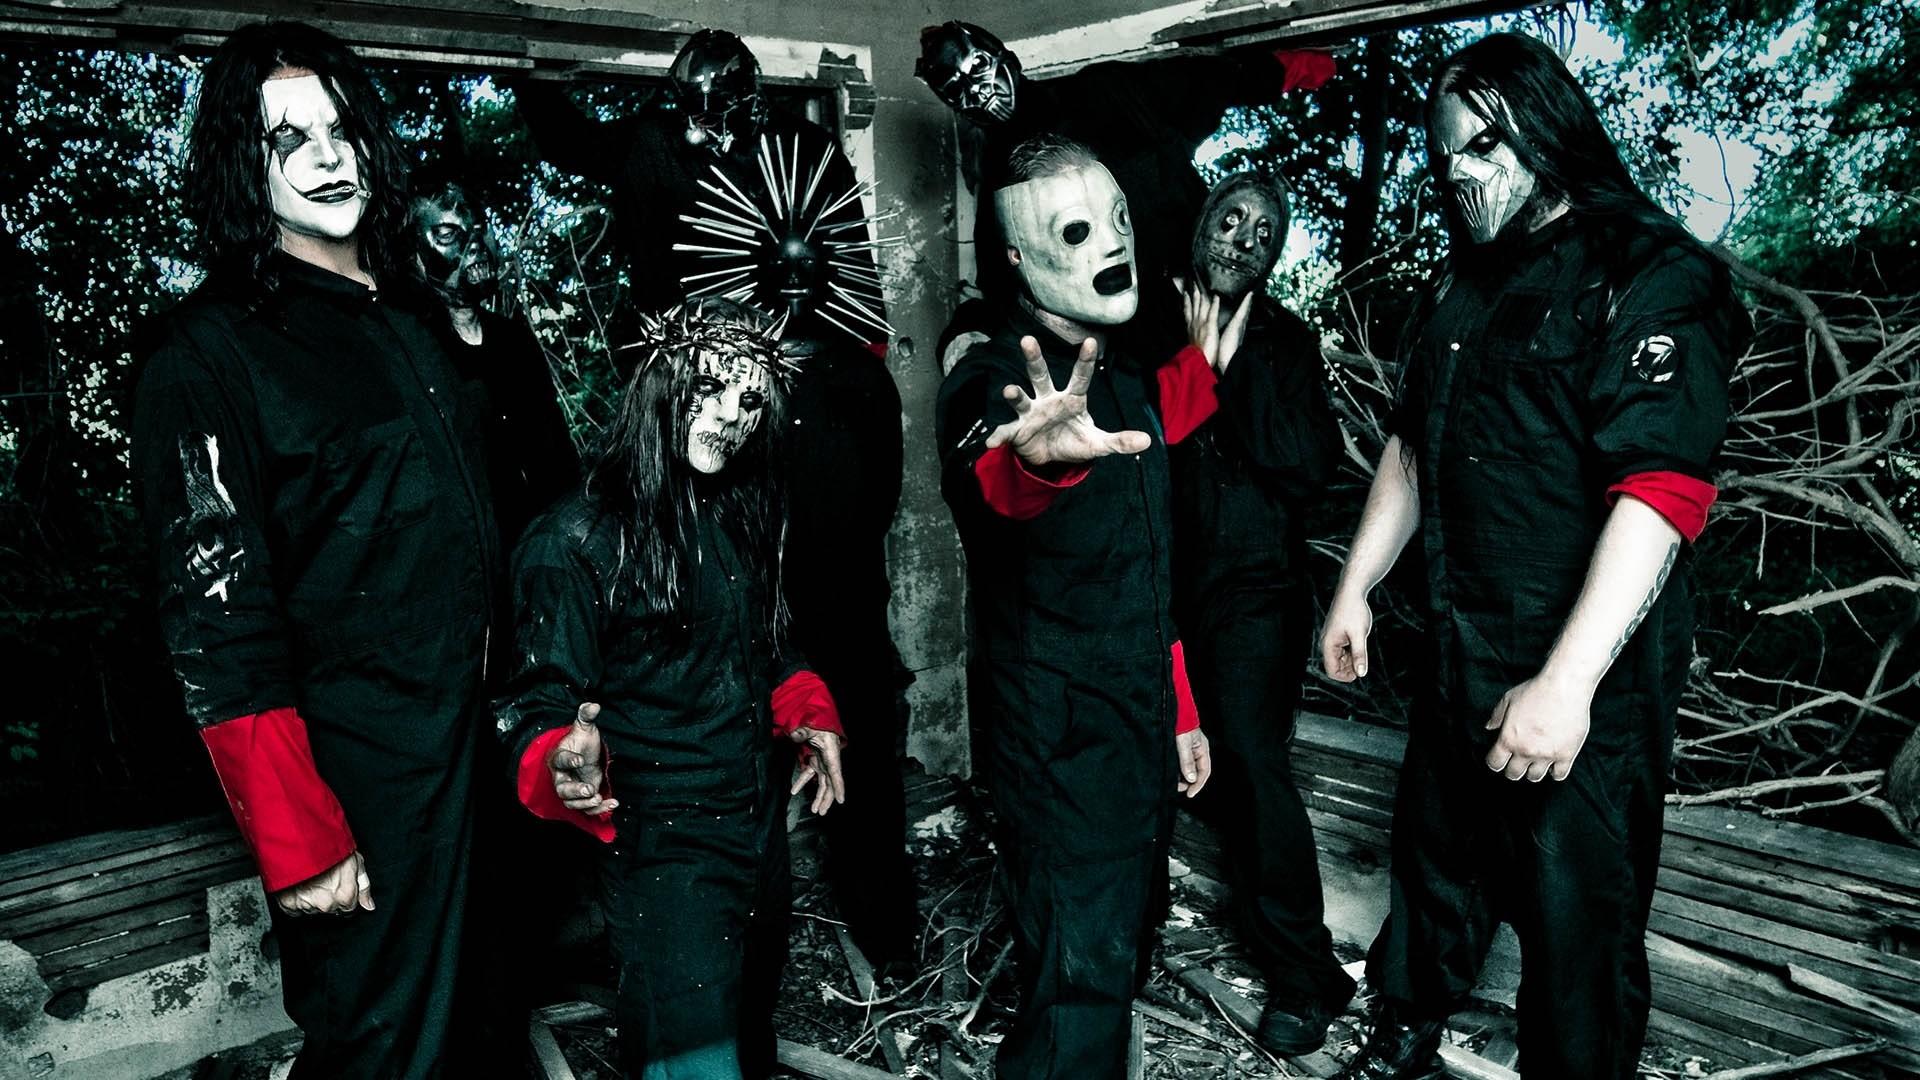 Slipknot wallpaper ·① Download free amazing HD wallpapers ...